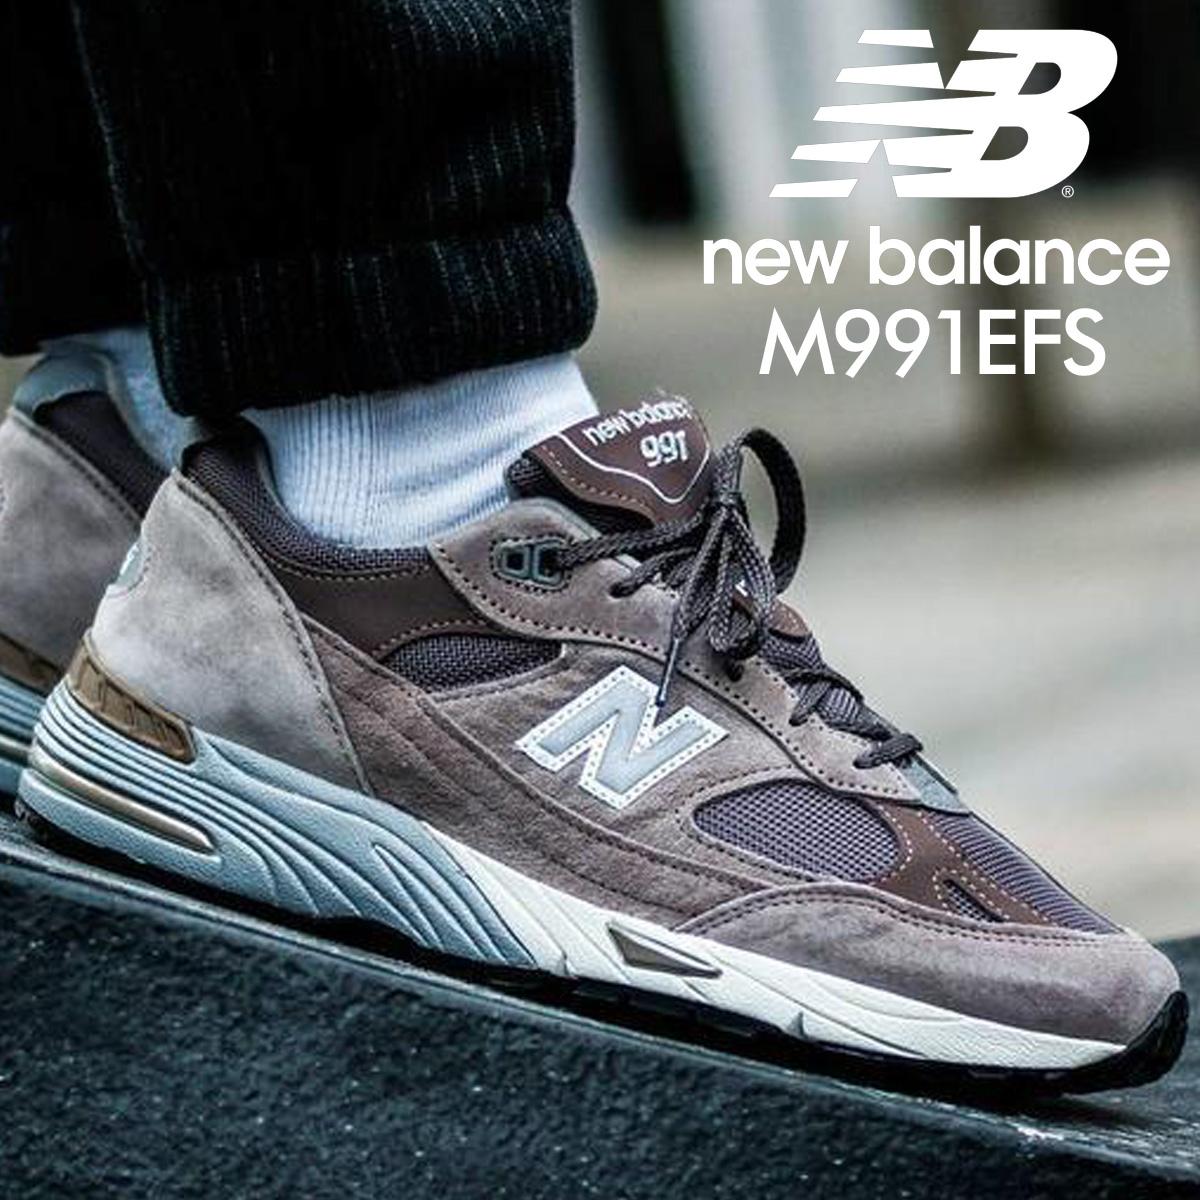 New Balance M991XG | Sneakers: New Balance 991 in 2019